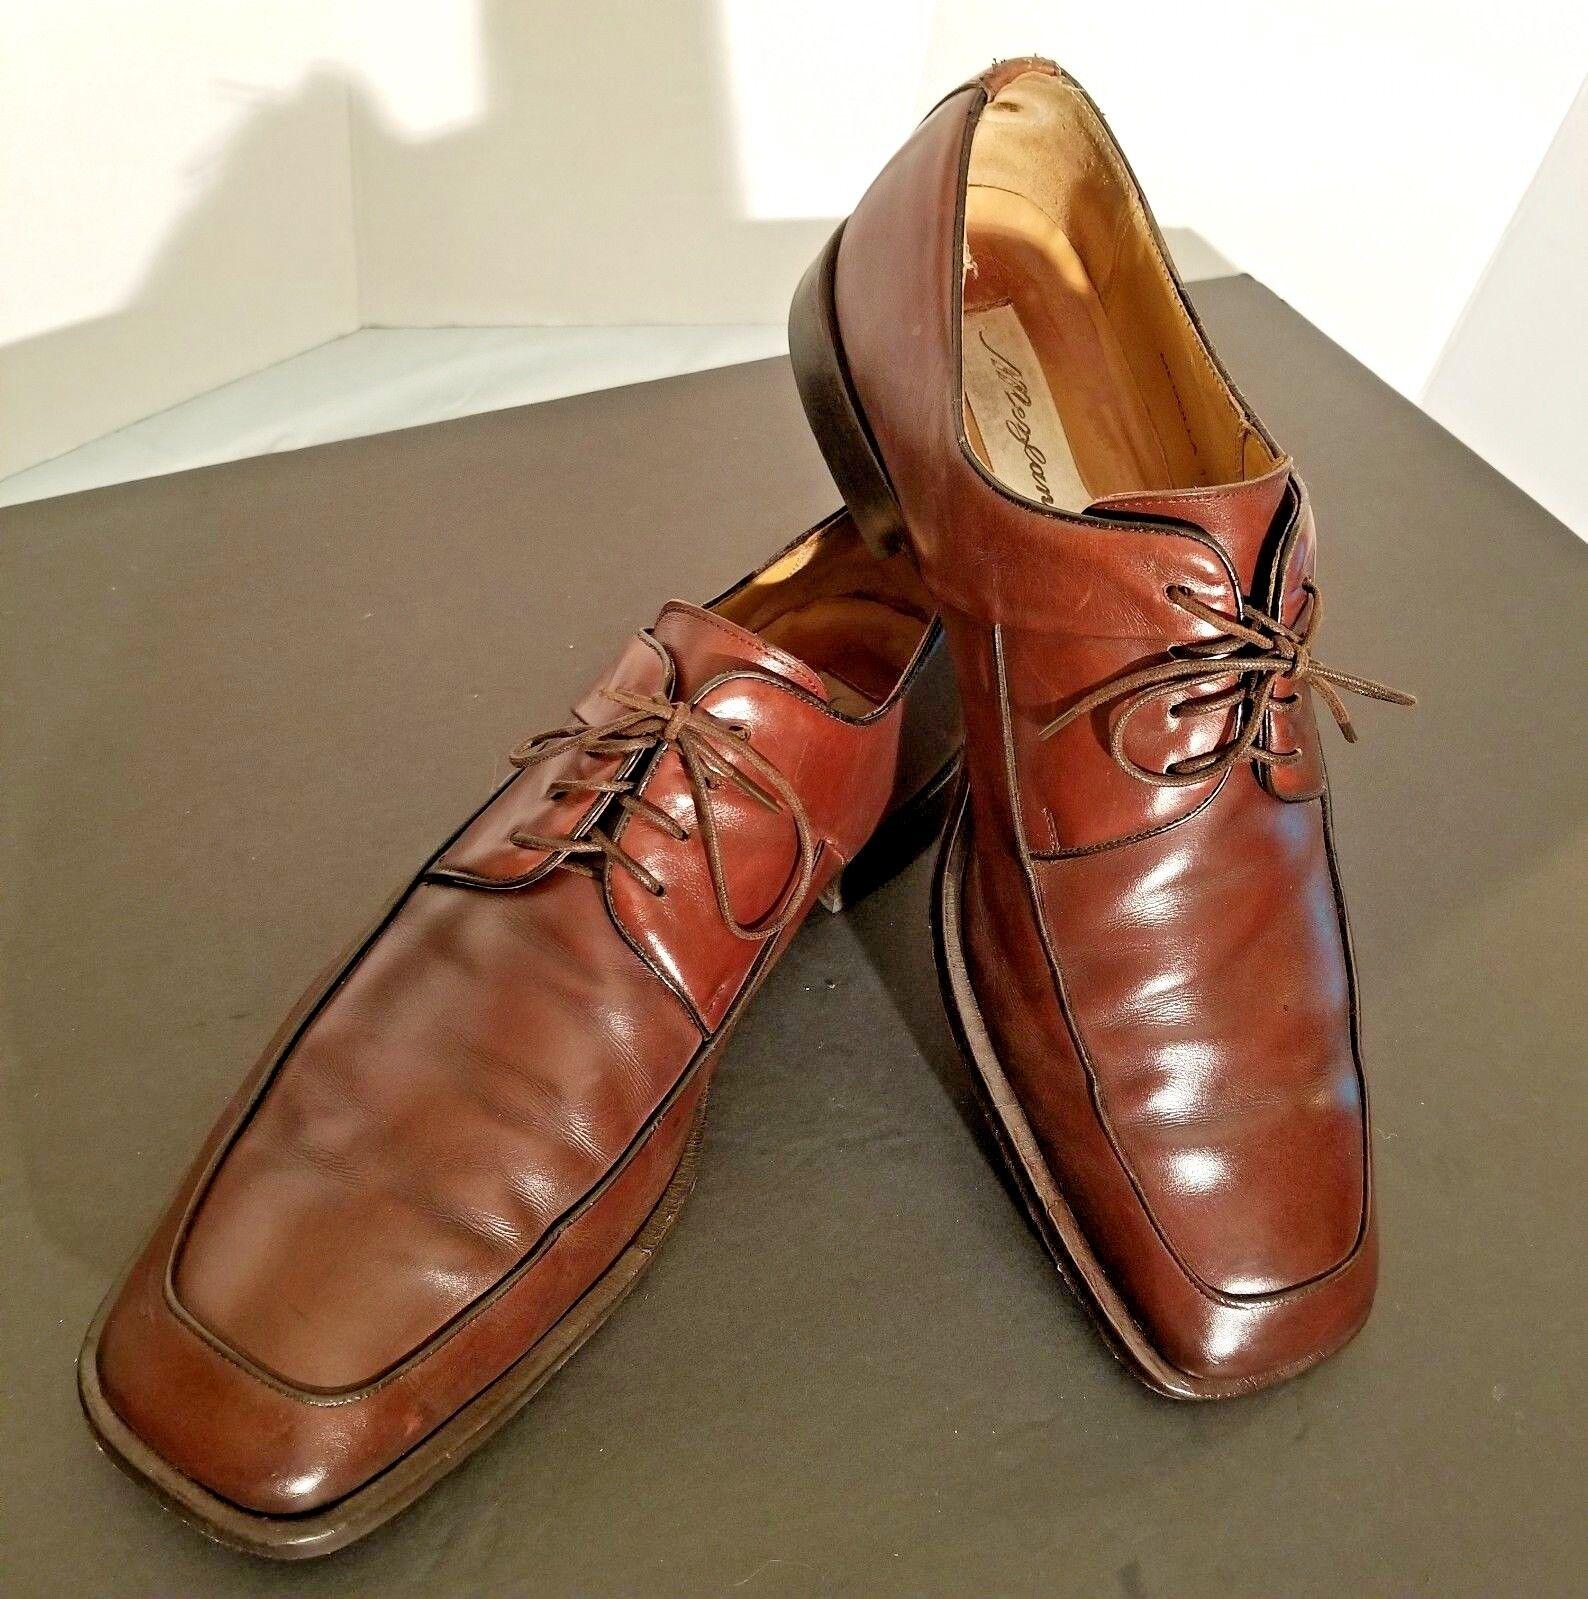 MEZLAN  Men's Brown Leather Square Toe Super Prime shoes Lace Up Sz 10.5 Medolla